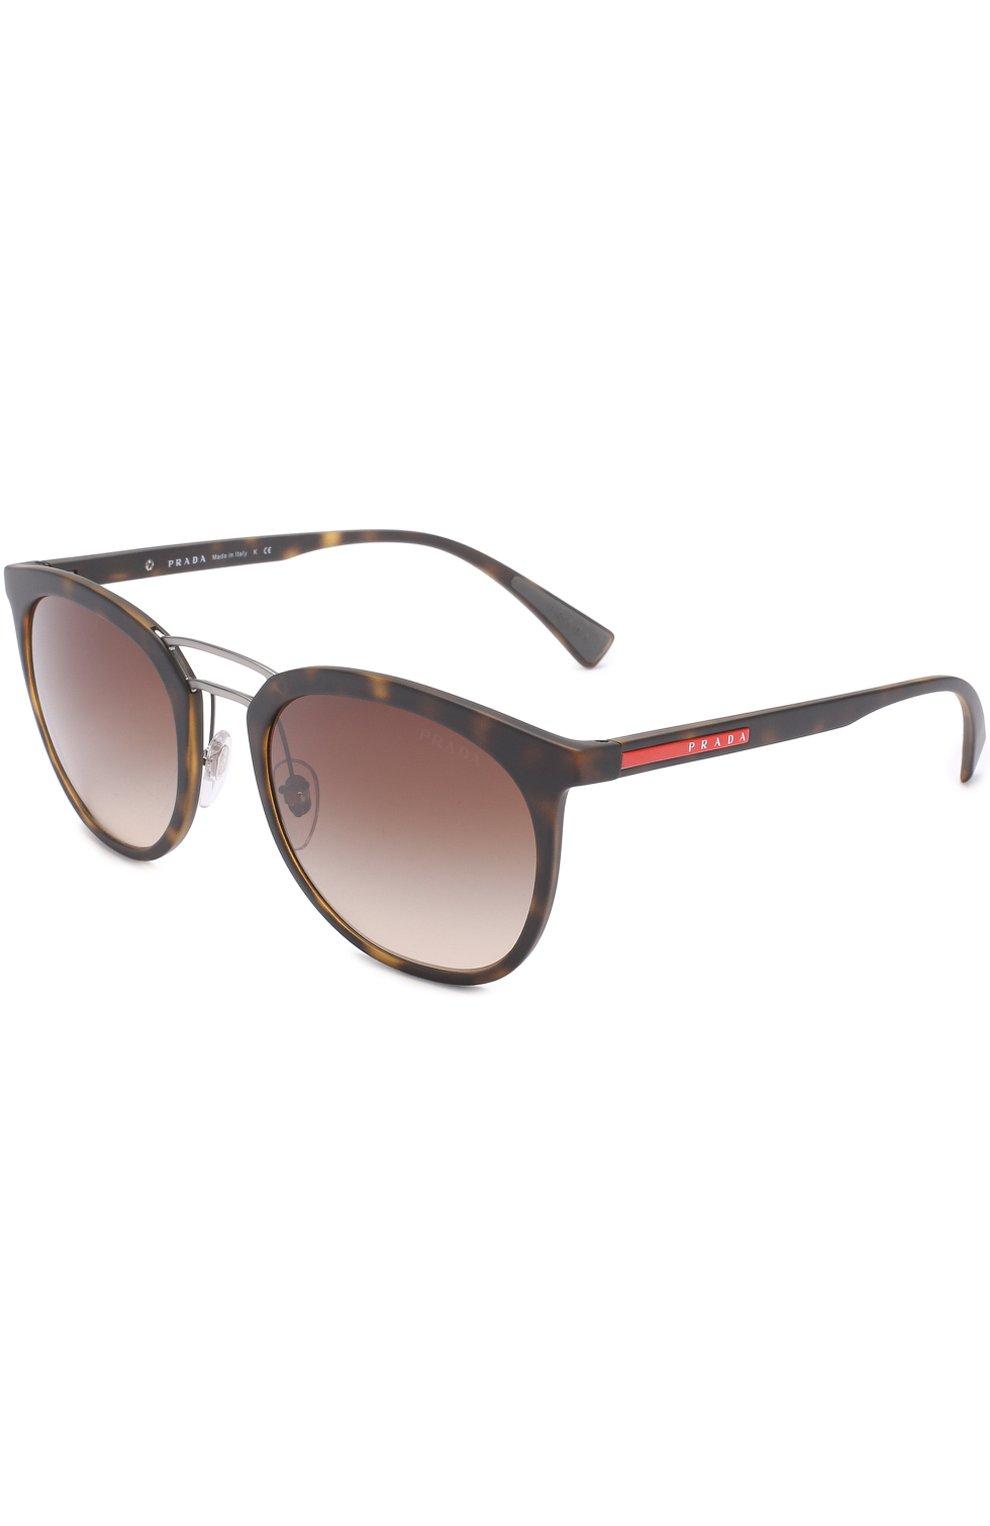 d77e52c9b706 Фото Мужские коричневые солнцезащитные очки prada linea rossa PRADA Италия  00013811 04SS-U616S1